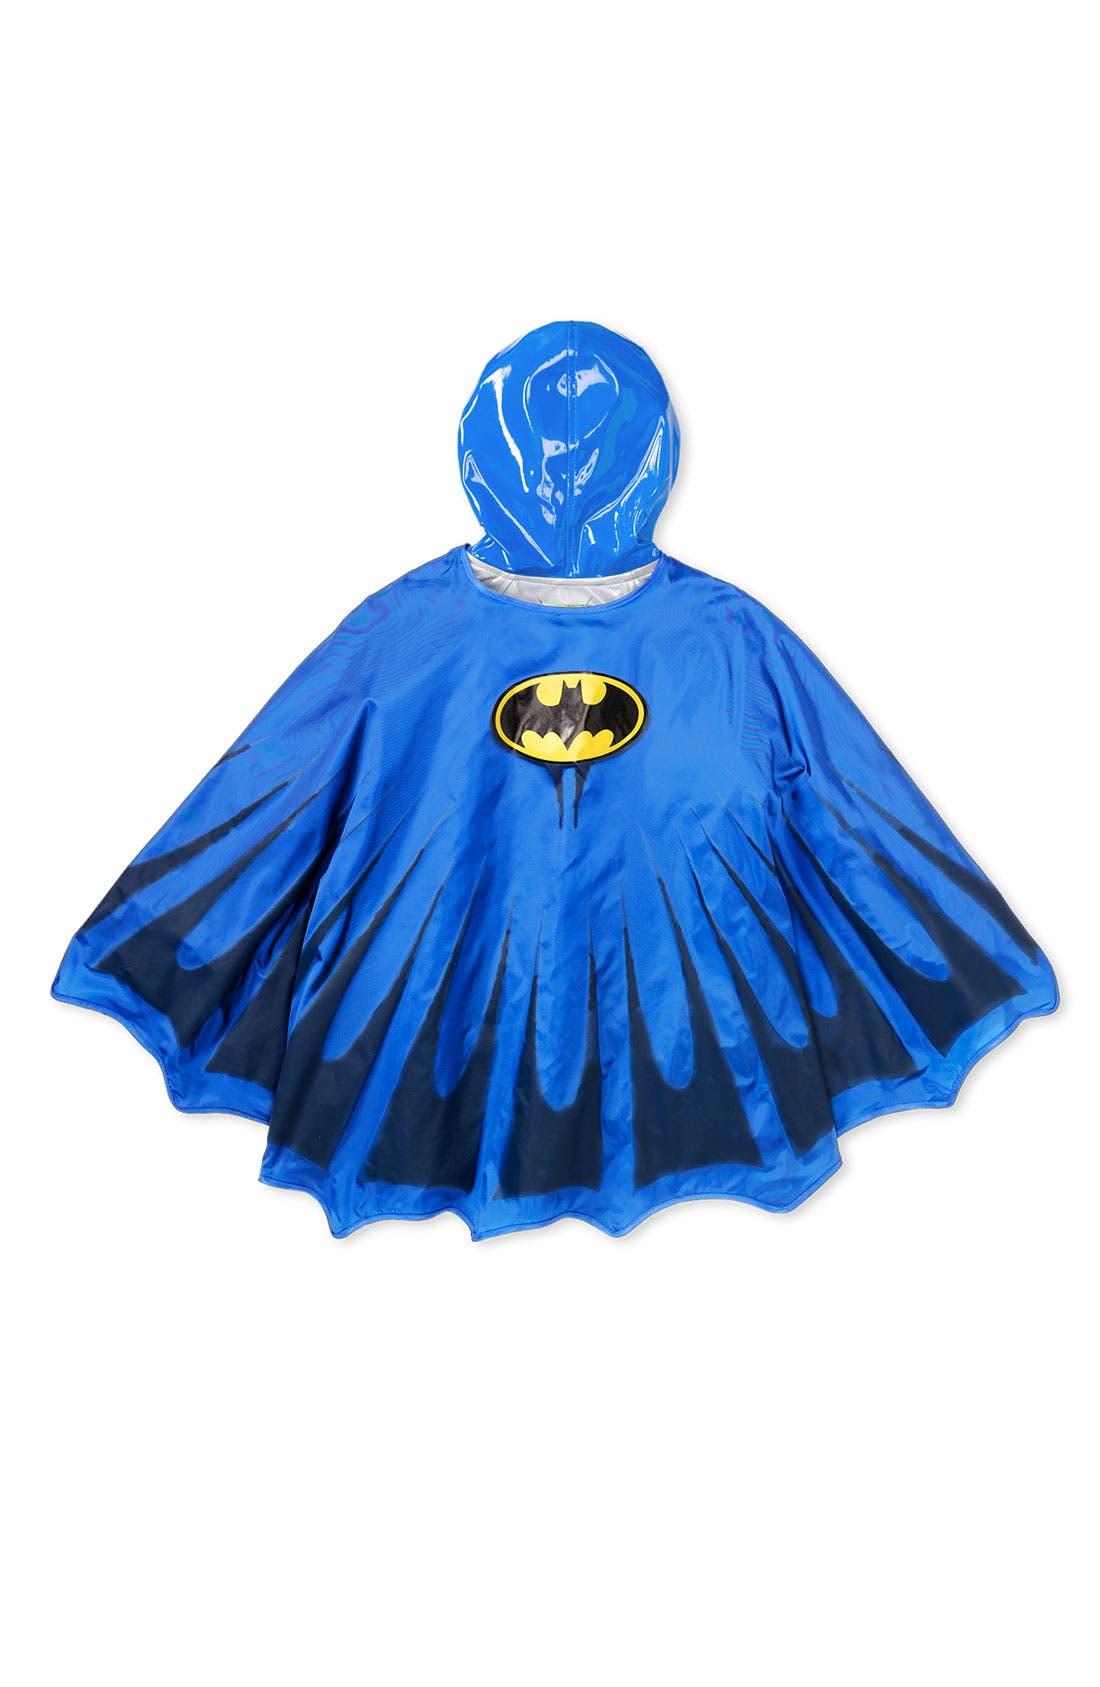 Alternate Image 2  - Western Chief 'Batman' Raincoat (Toddler Boys & Little Boys)